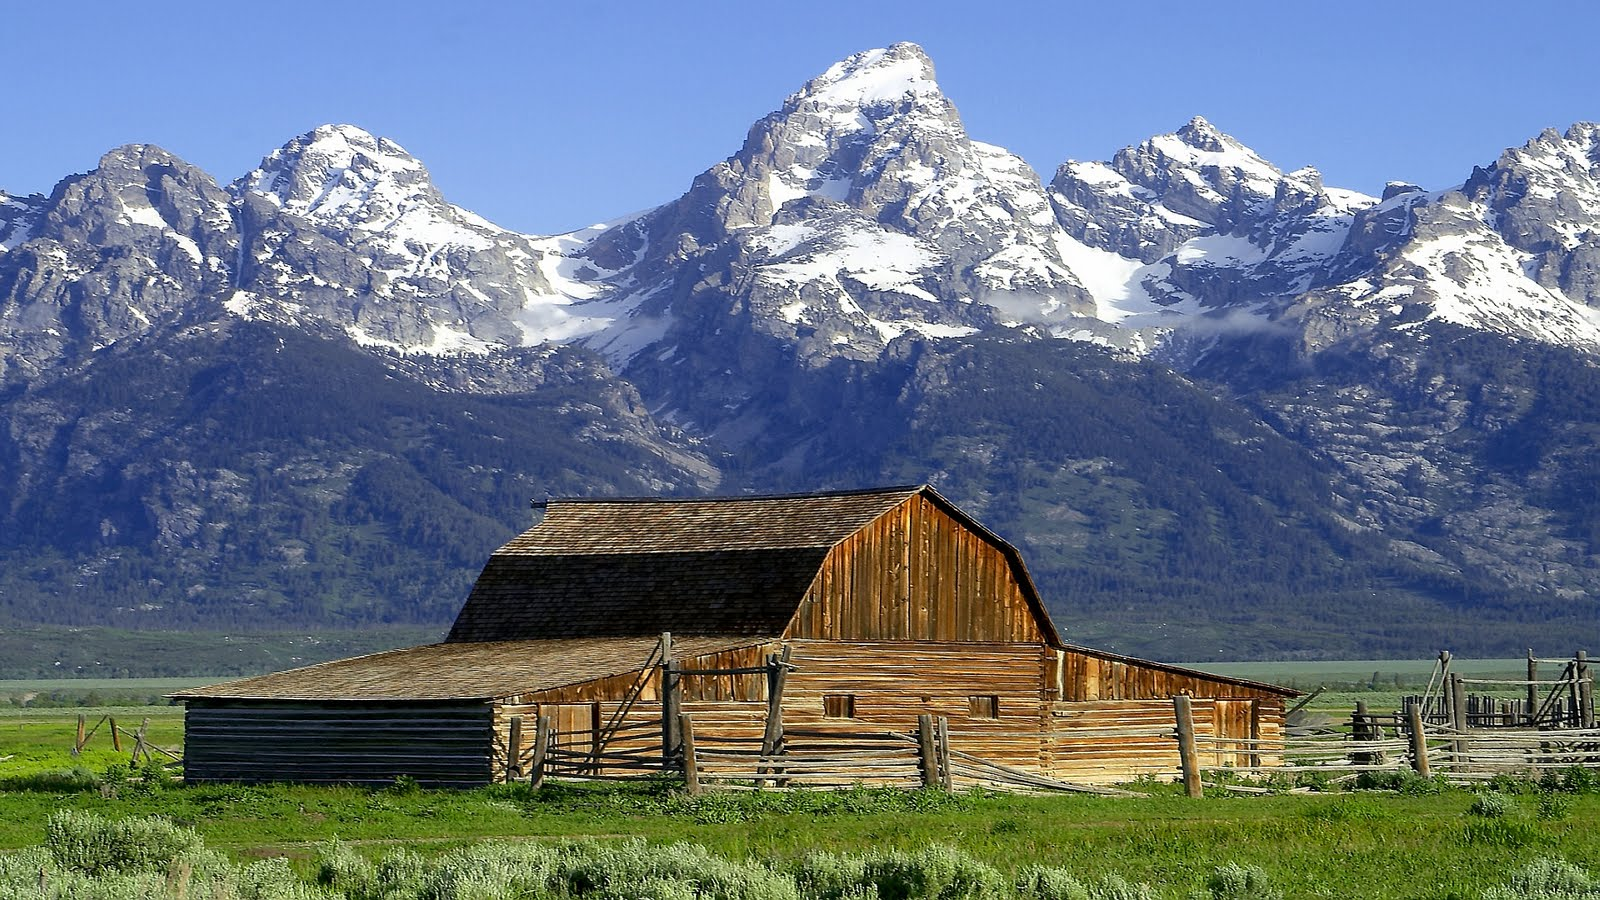 http://3.bp.blogspot.com/-0MPLyfzVxy8/TlsJhwfJCAI/AAAAAAAAAAM/5UYLdPKlAmI/s1600/barns-grand-tetons-photography-art-image.jpg